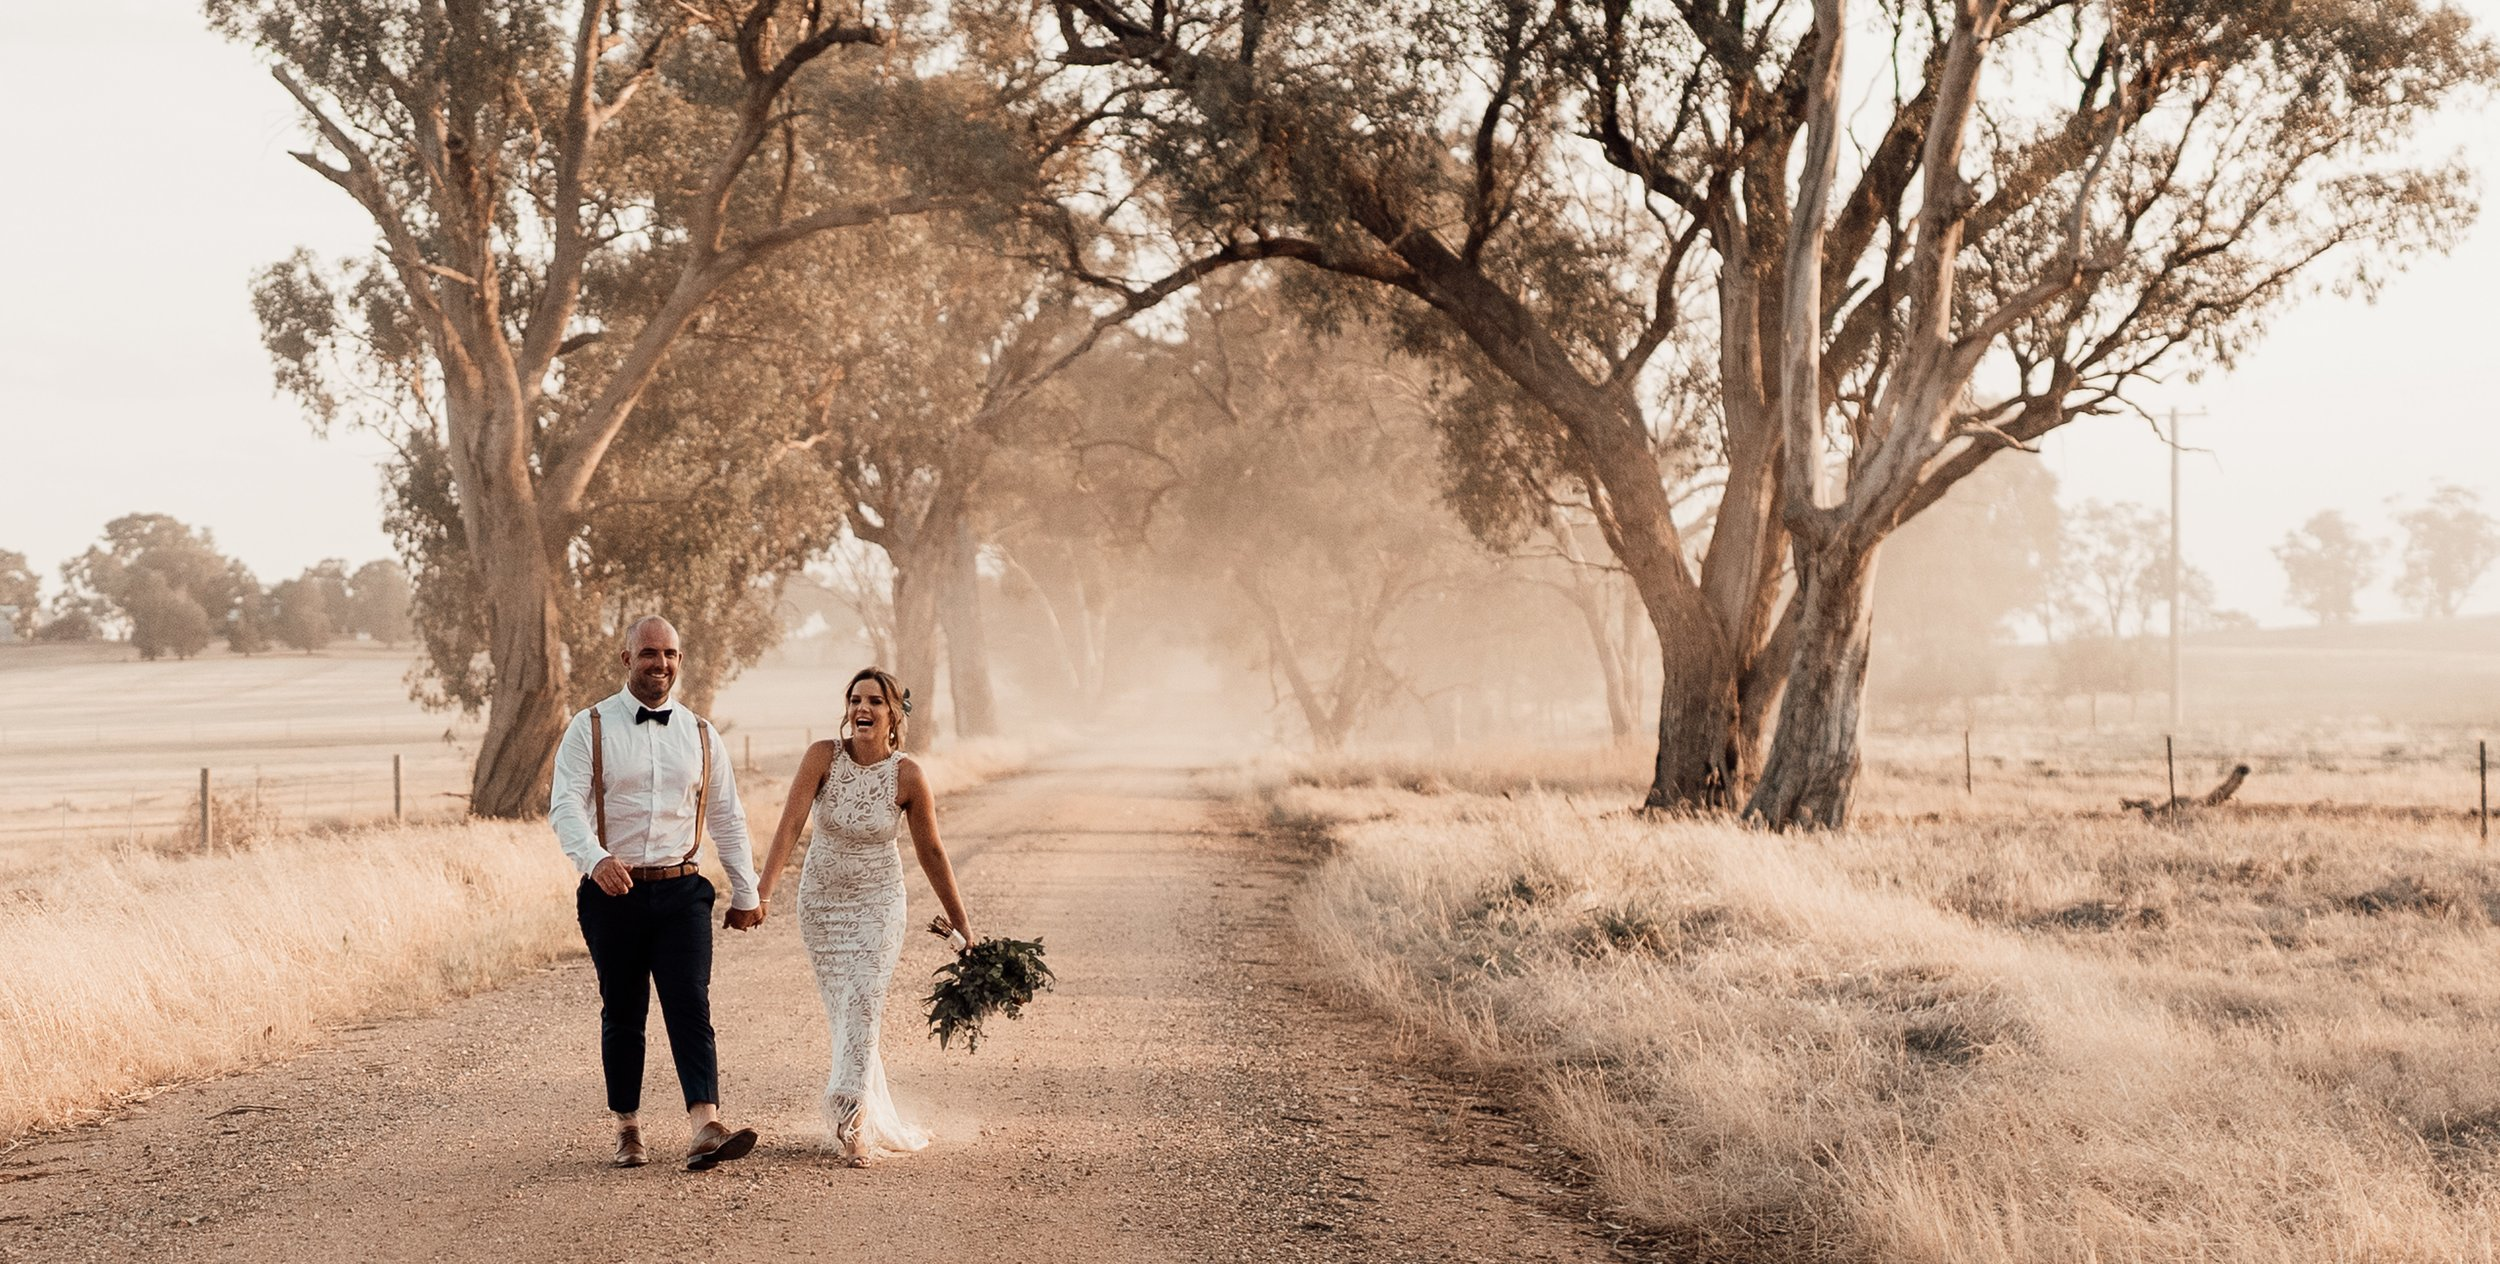 mickalathomas_puremacphotography_weddingphotographer_couplephotographer_Sheppartonphotographer_1472.jpg